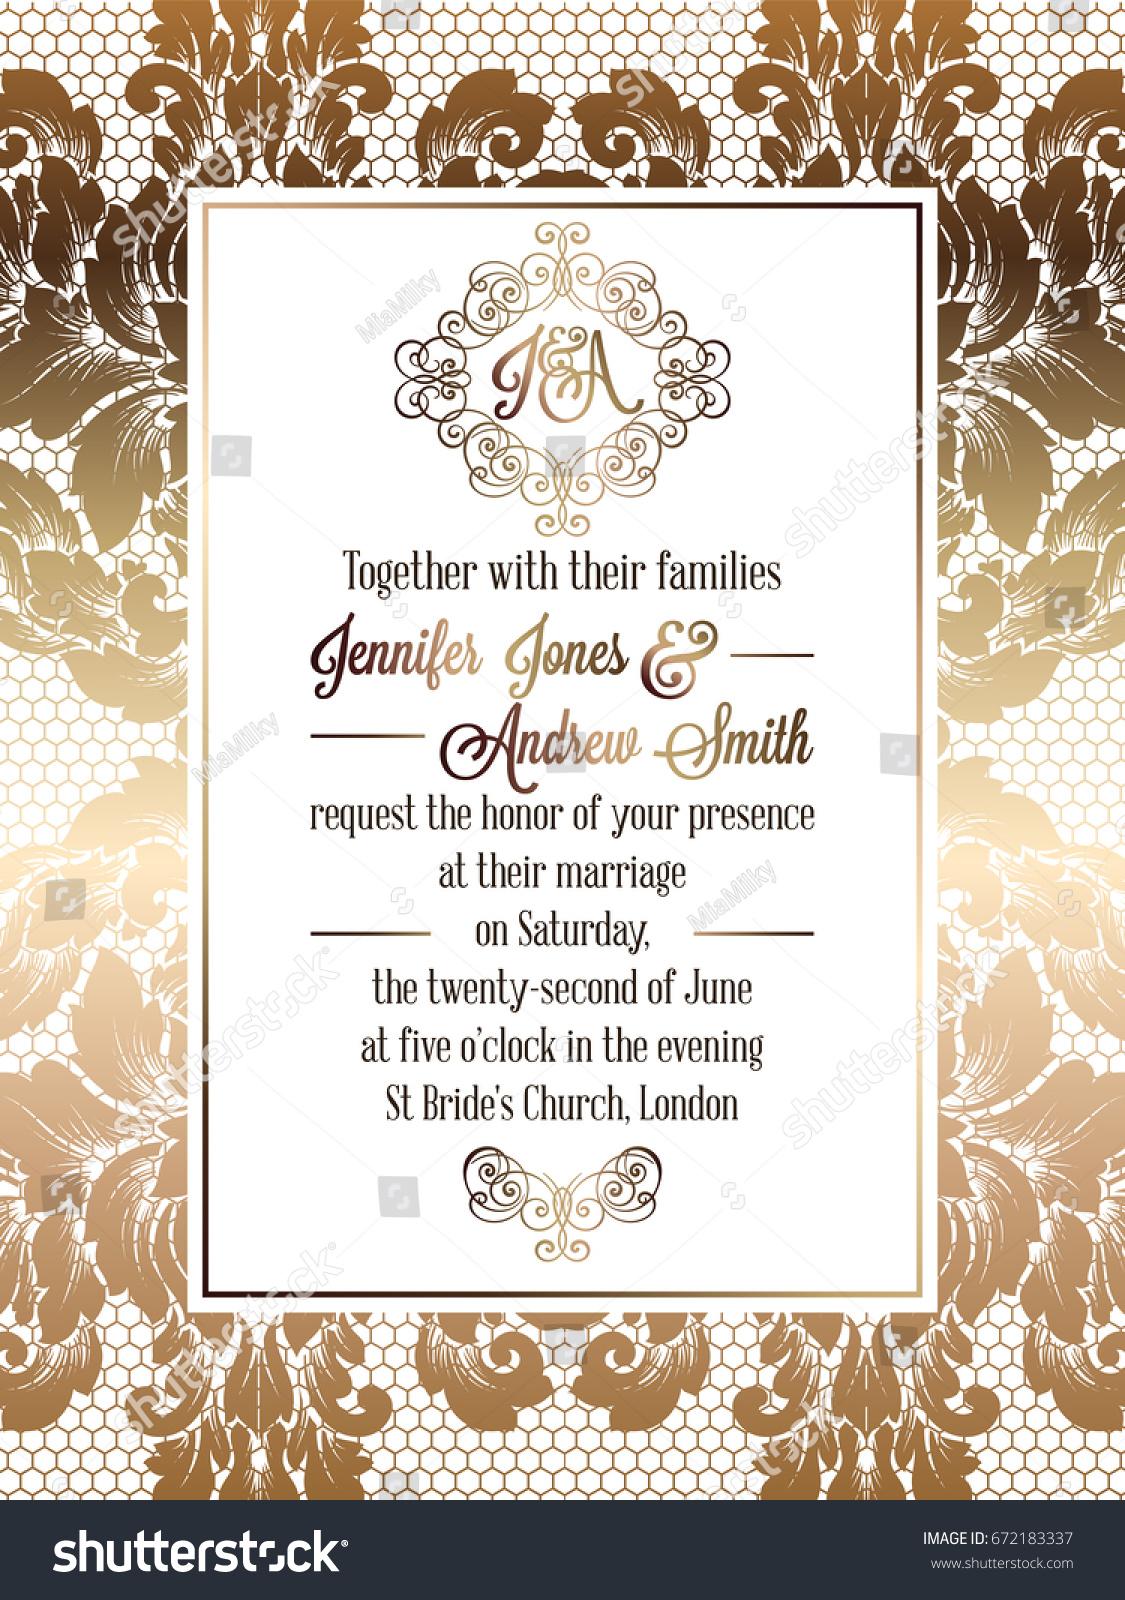 Vintage baroque style wedding invitation card stock vector vintage baroque style wedding invitation card stock vector 672183337 shutterstock stopboris Choice Image